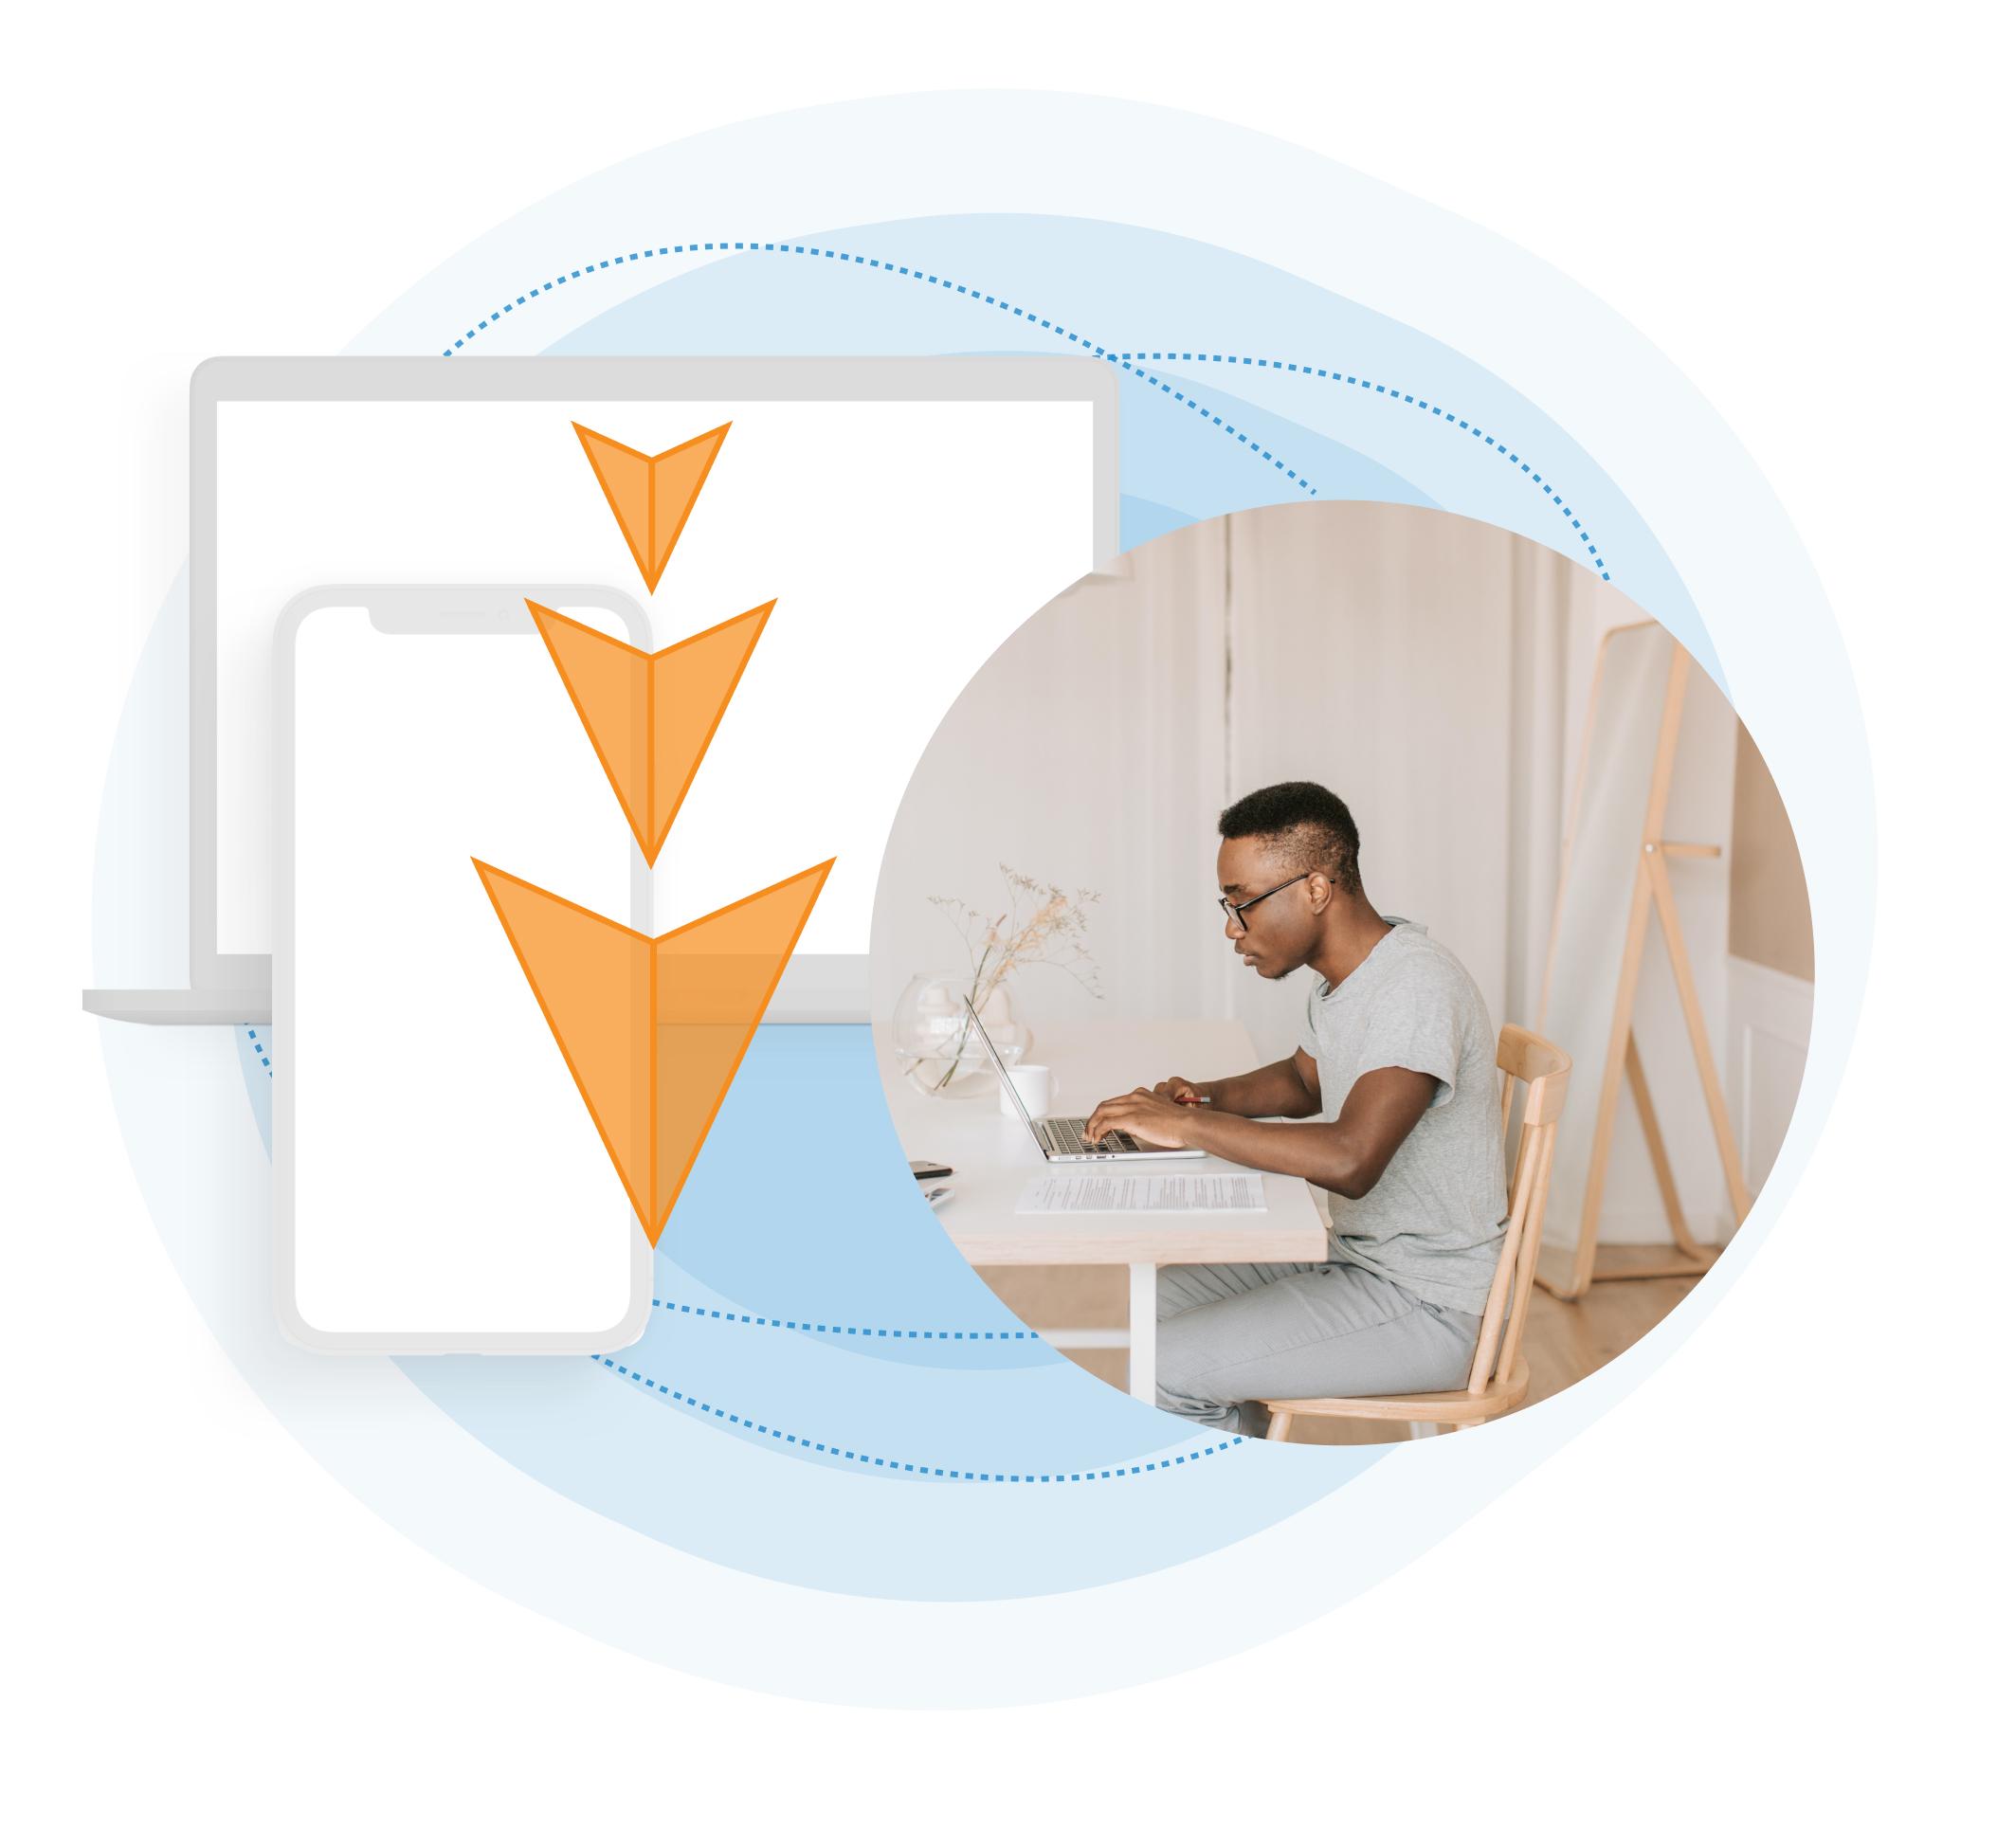 Image of man sitting at desk overlaying laptop graphic